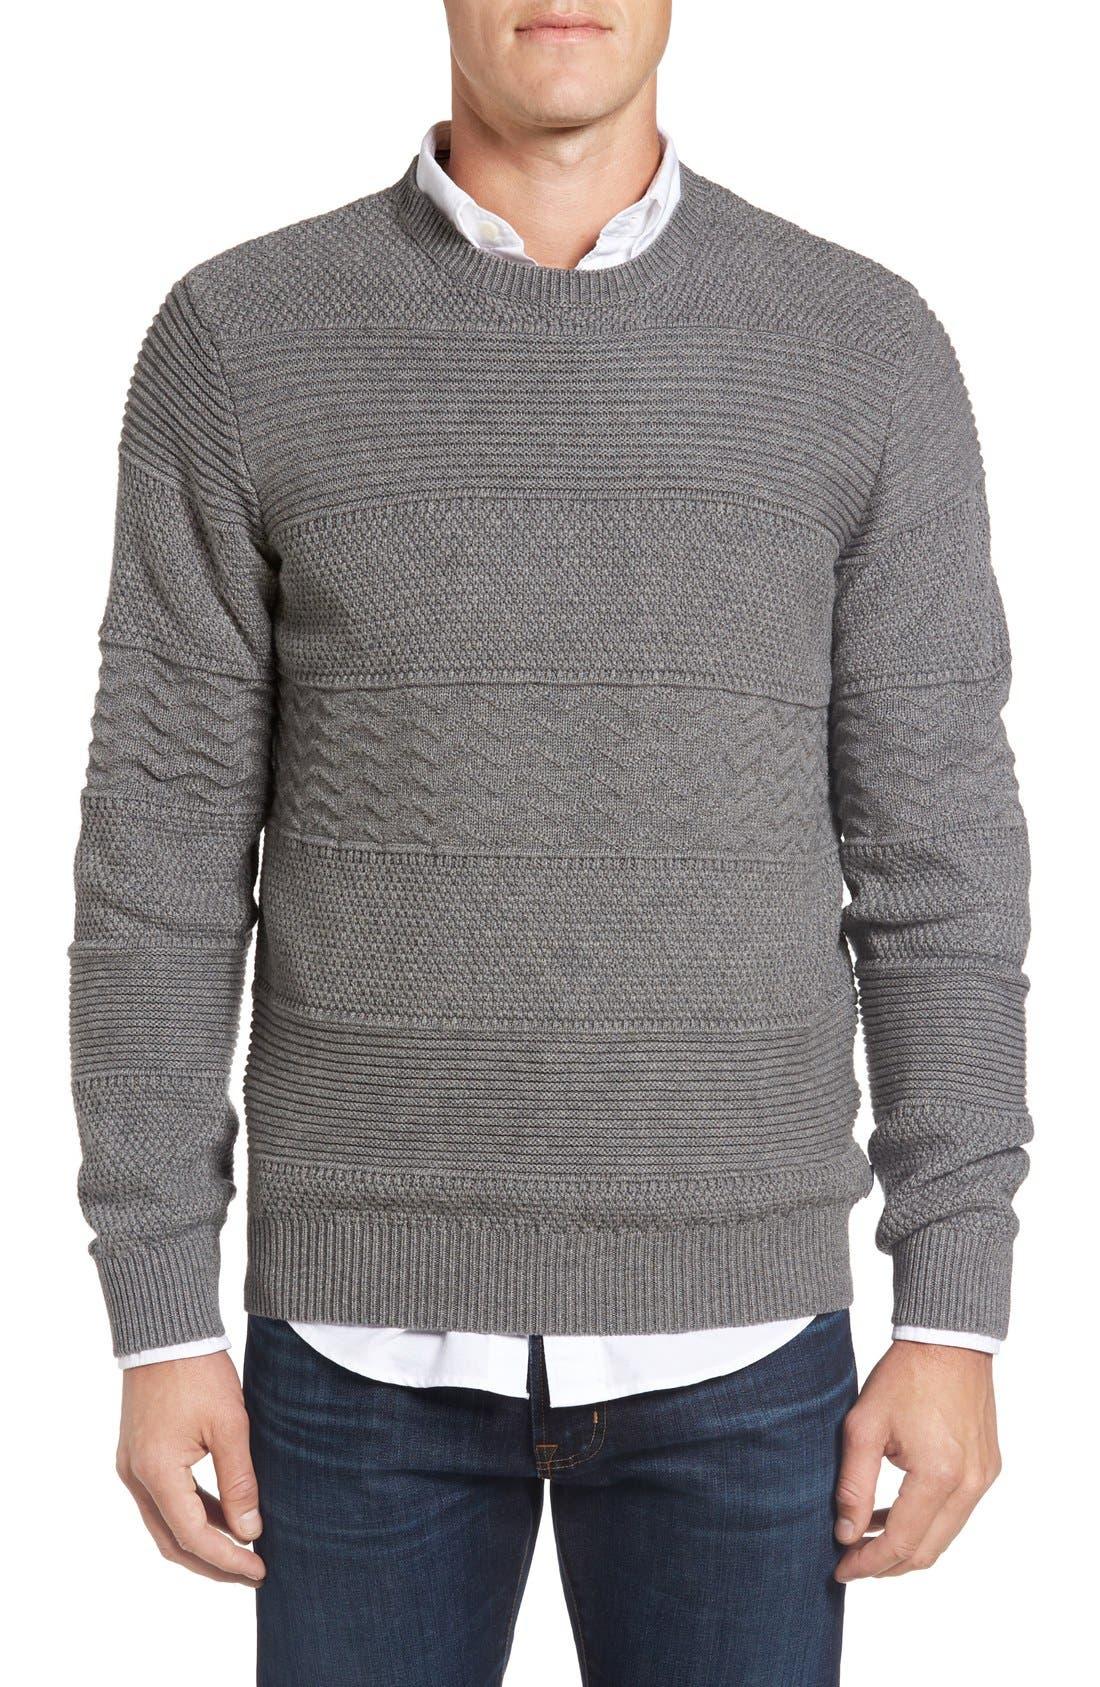 Main Image - Gant Structure Crewneck Sweater